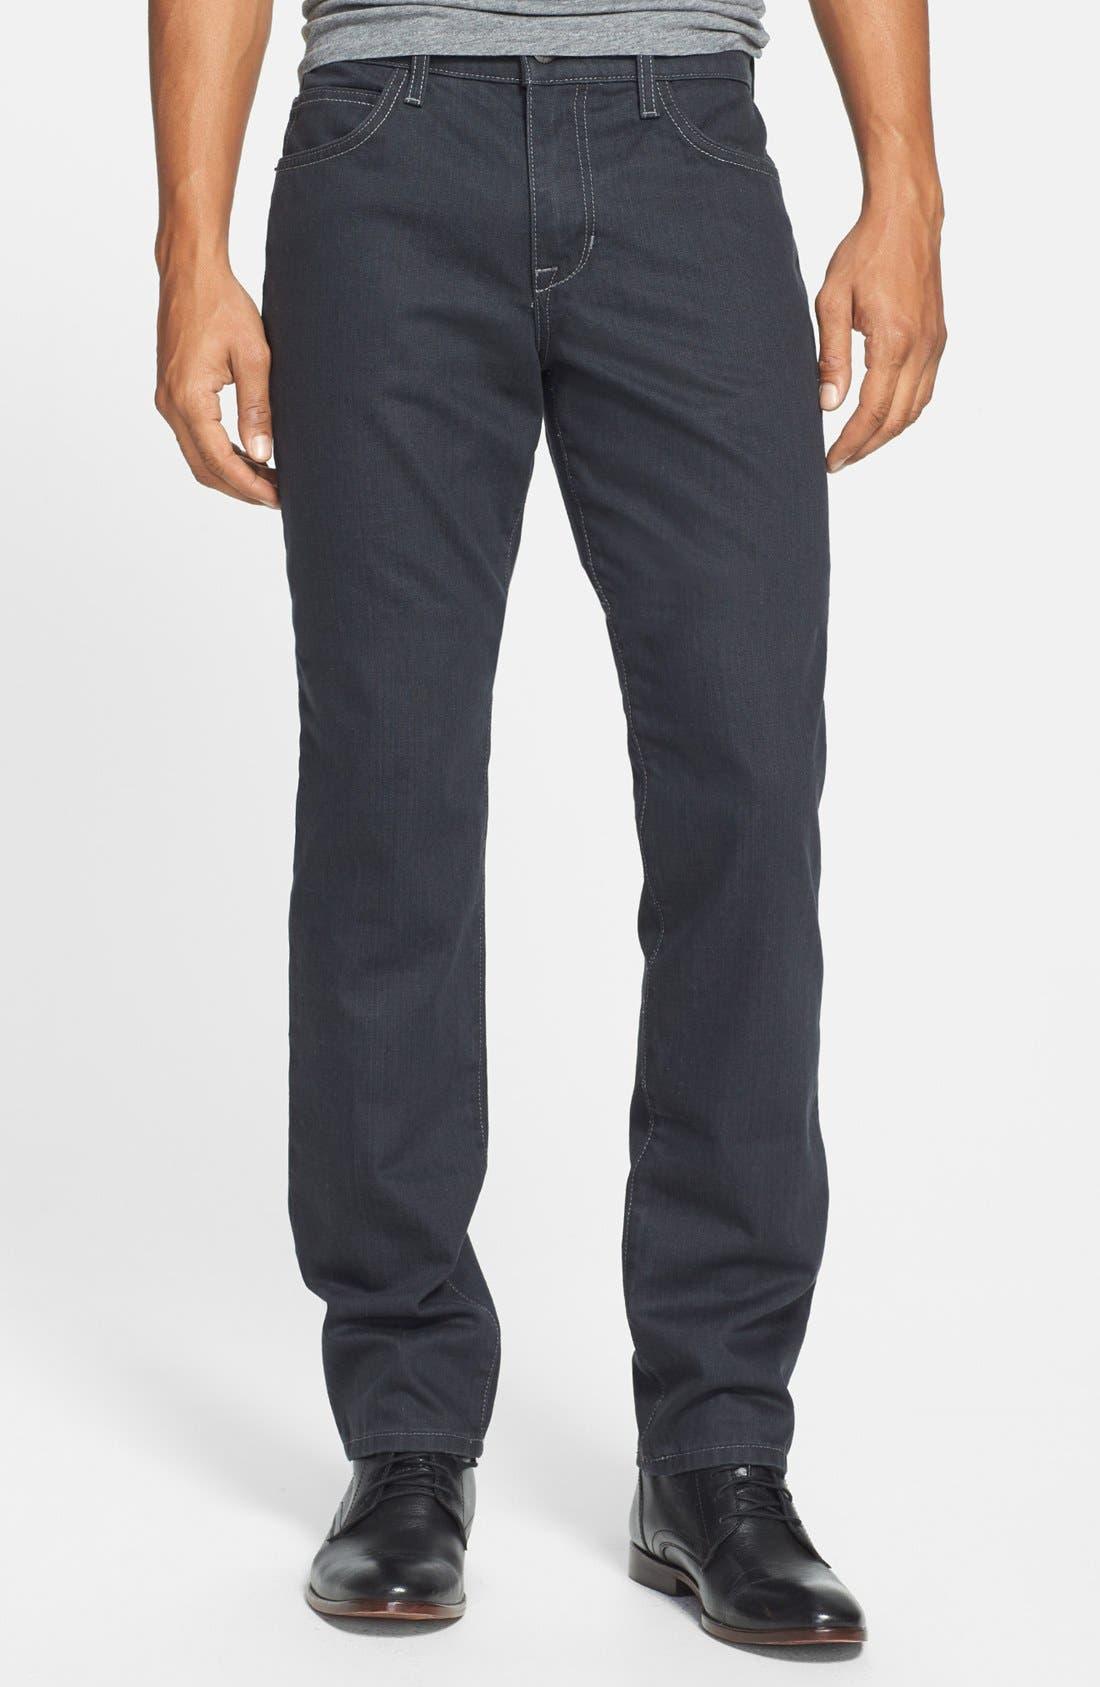 Main Image - Joe's 'Slim' Skinny Fit Jeans (Richie)